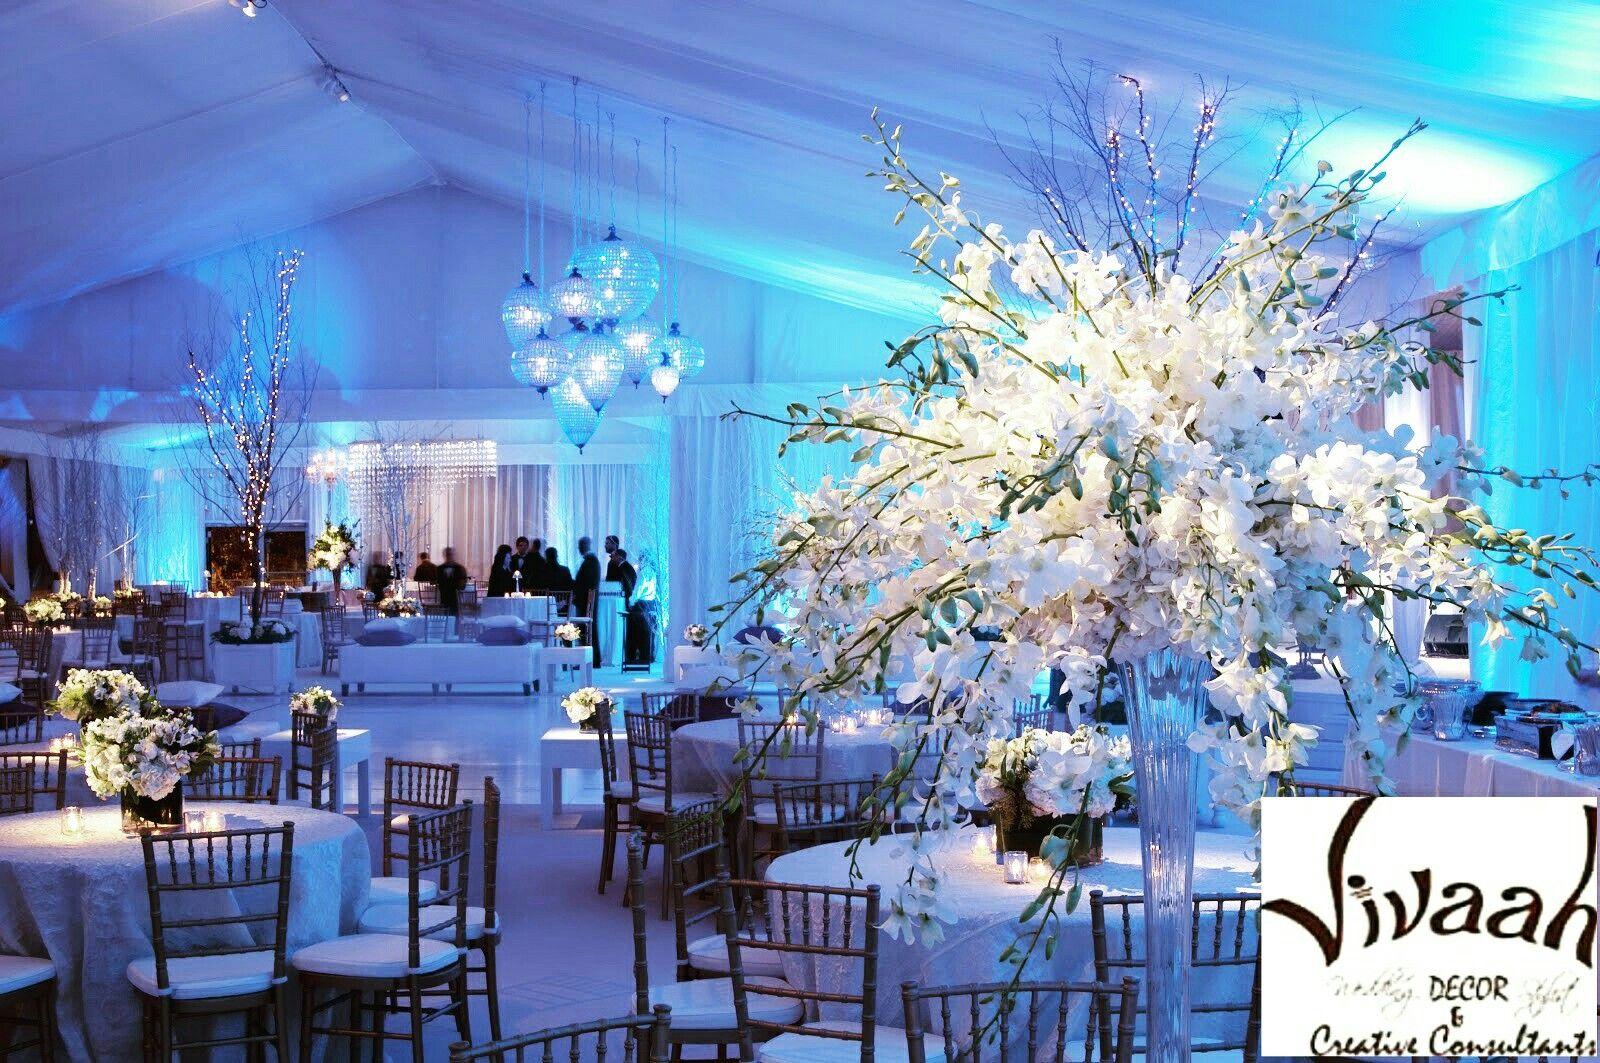 Blue themed wedding decor  Love dream weddinvivaah dream decor party cruisers  Destination